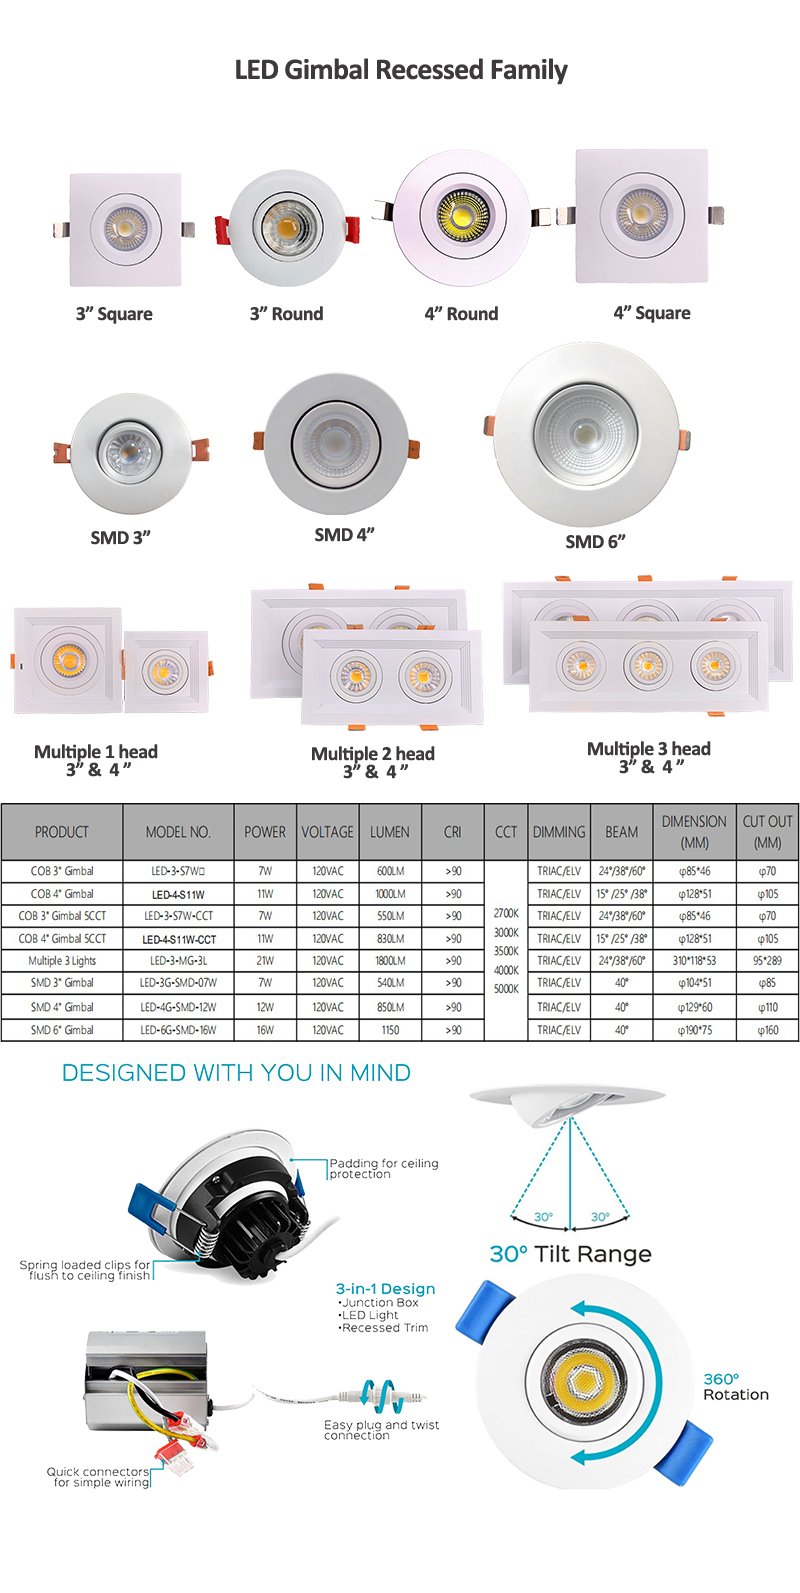 ETL 11W 4 Inch Recessed Ceiling Dimmable trimless indoor lighting aluminium profile adjustable housing indoor cob led downlight